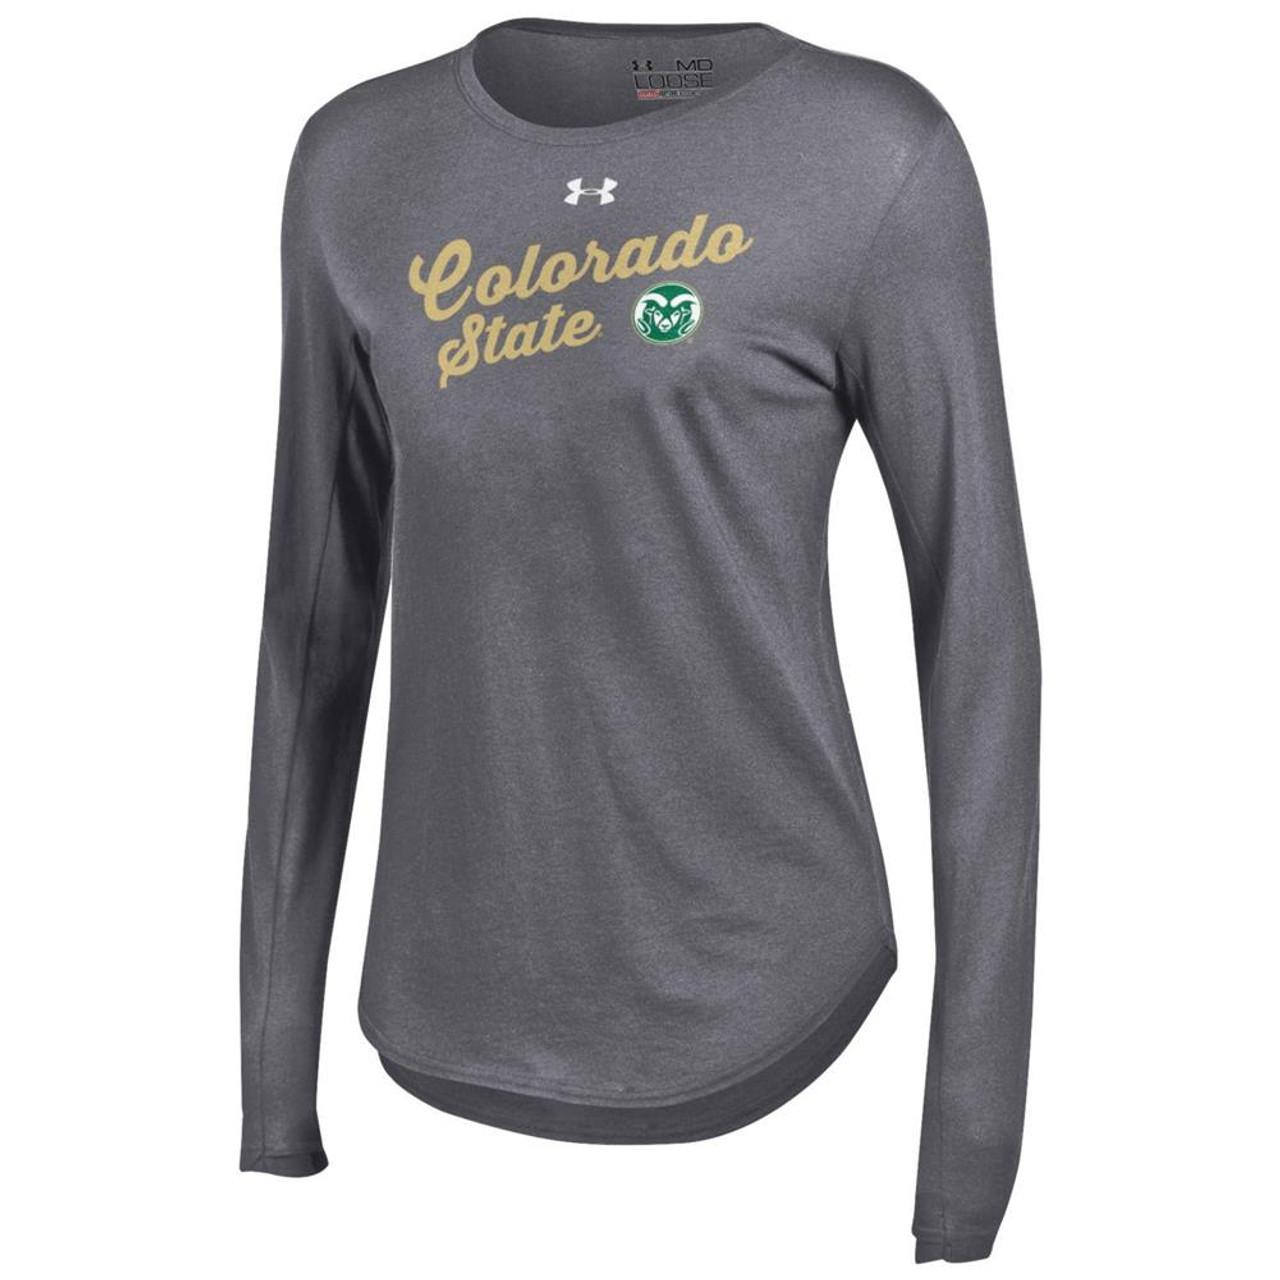 Women's Long Sleeve Colorado State Rams Under Armour Baseball Tee